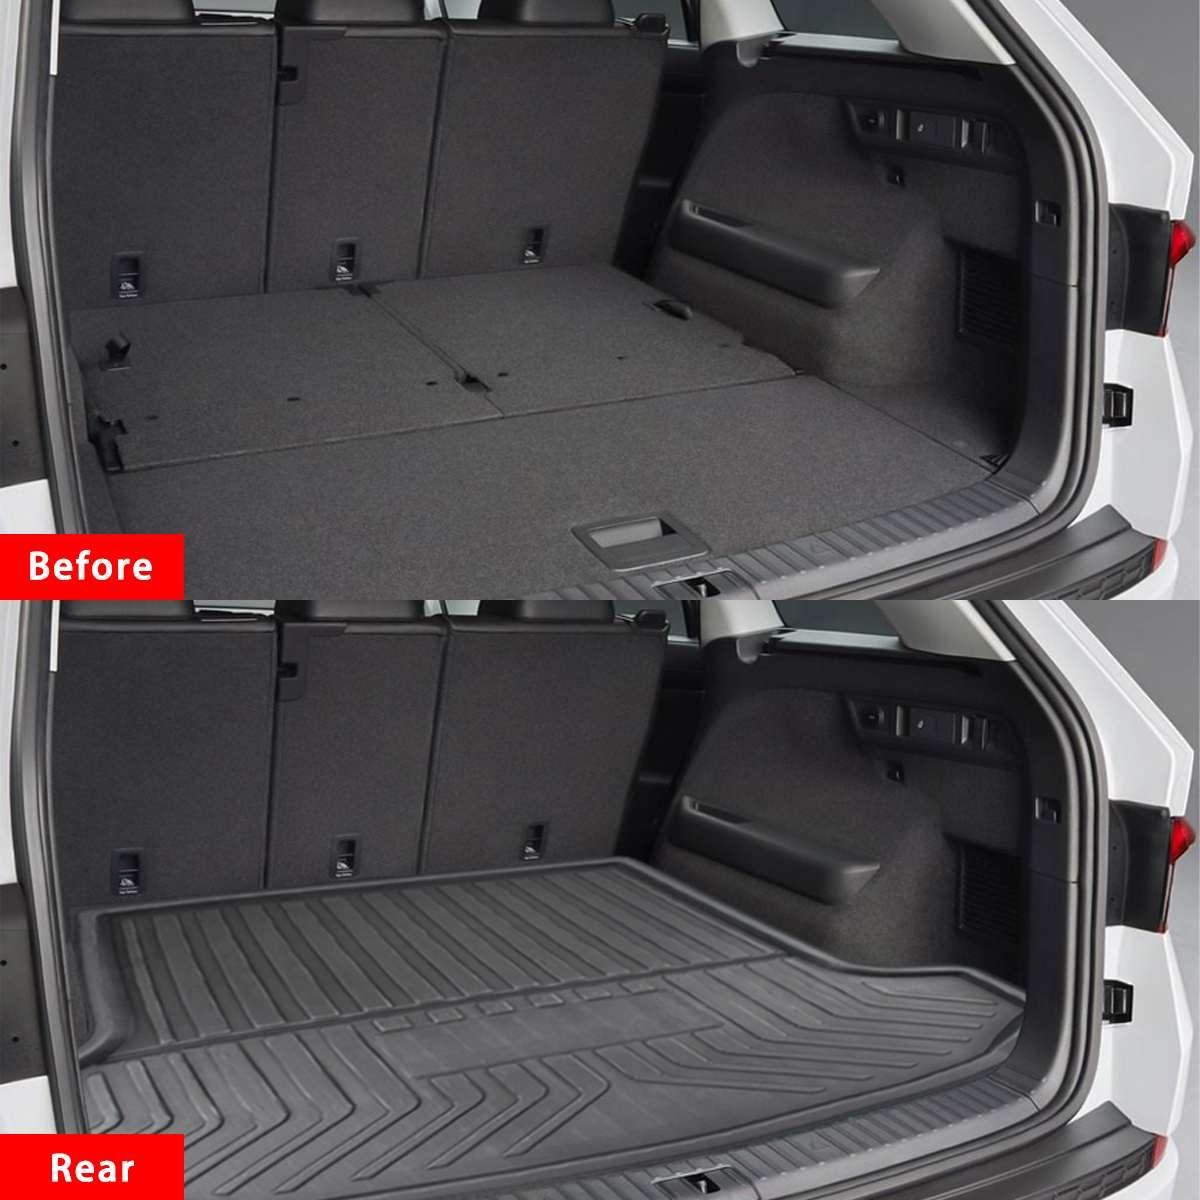 Car Cargo Liner Boot Tray Rear Trunk Cover Matt Mat Floor Carpet Kick Pad For SKODA Kodiaq 5/7 Seat Seater 2017 2018 2019